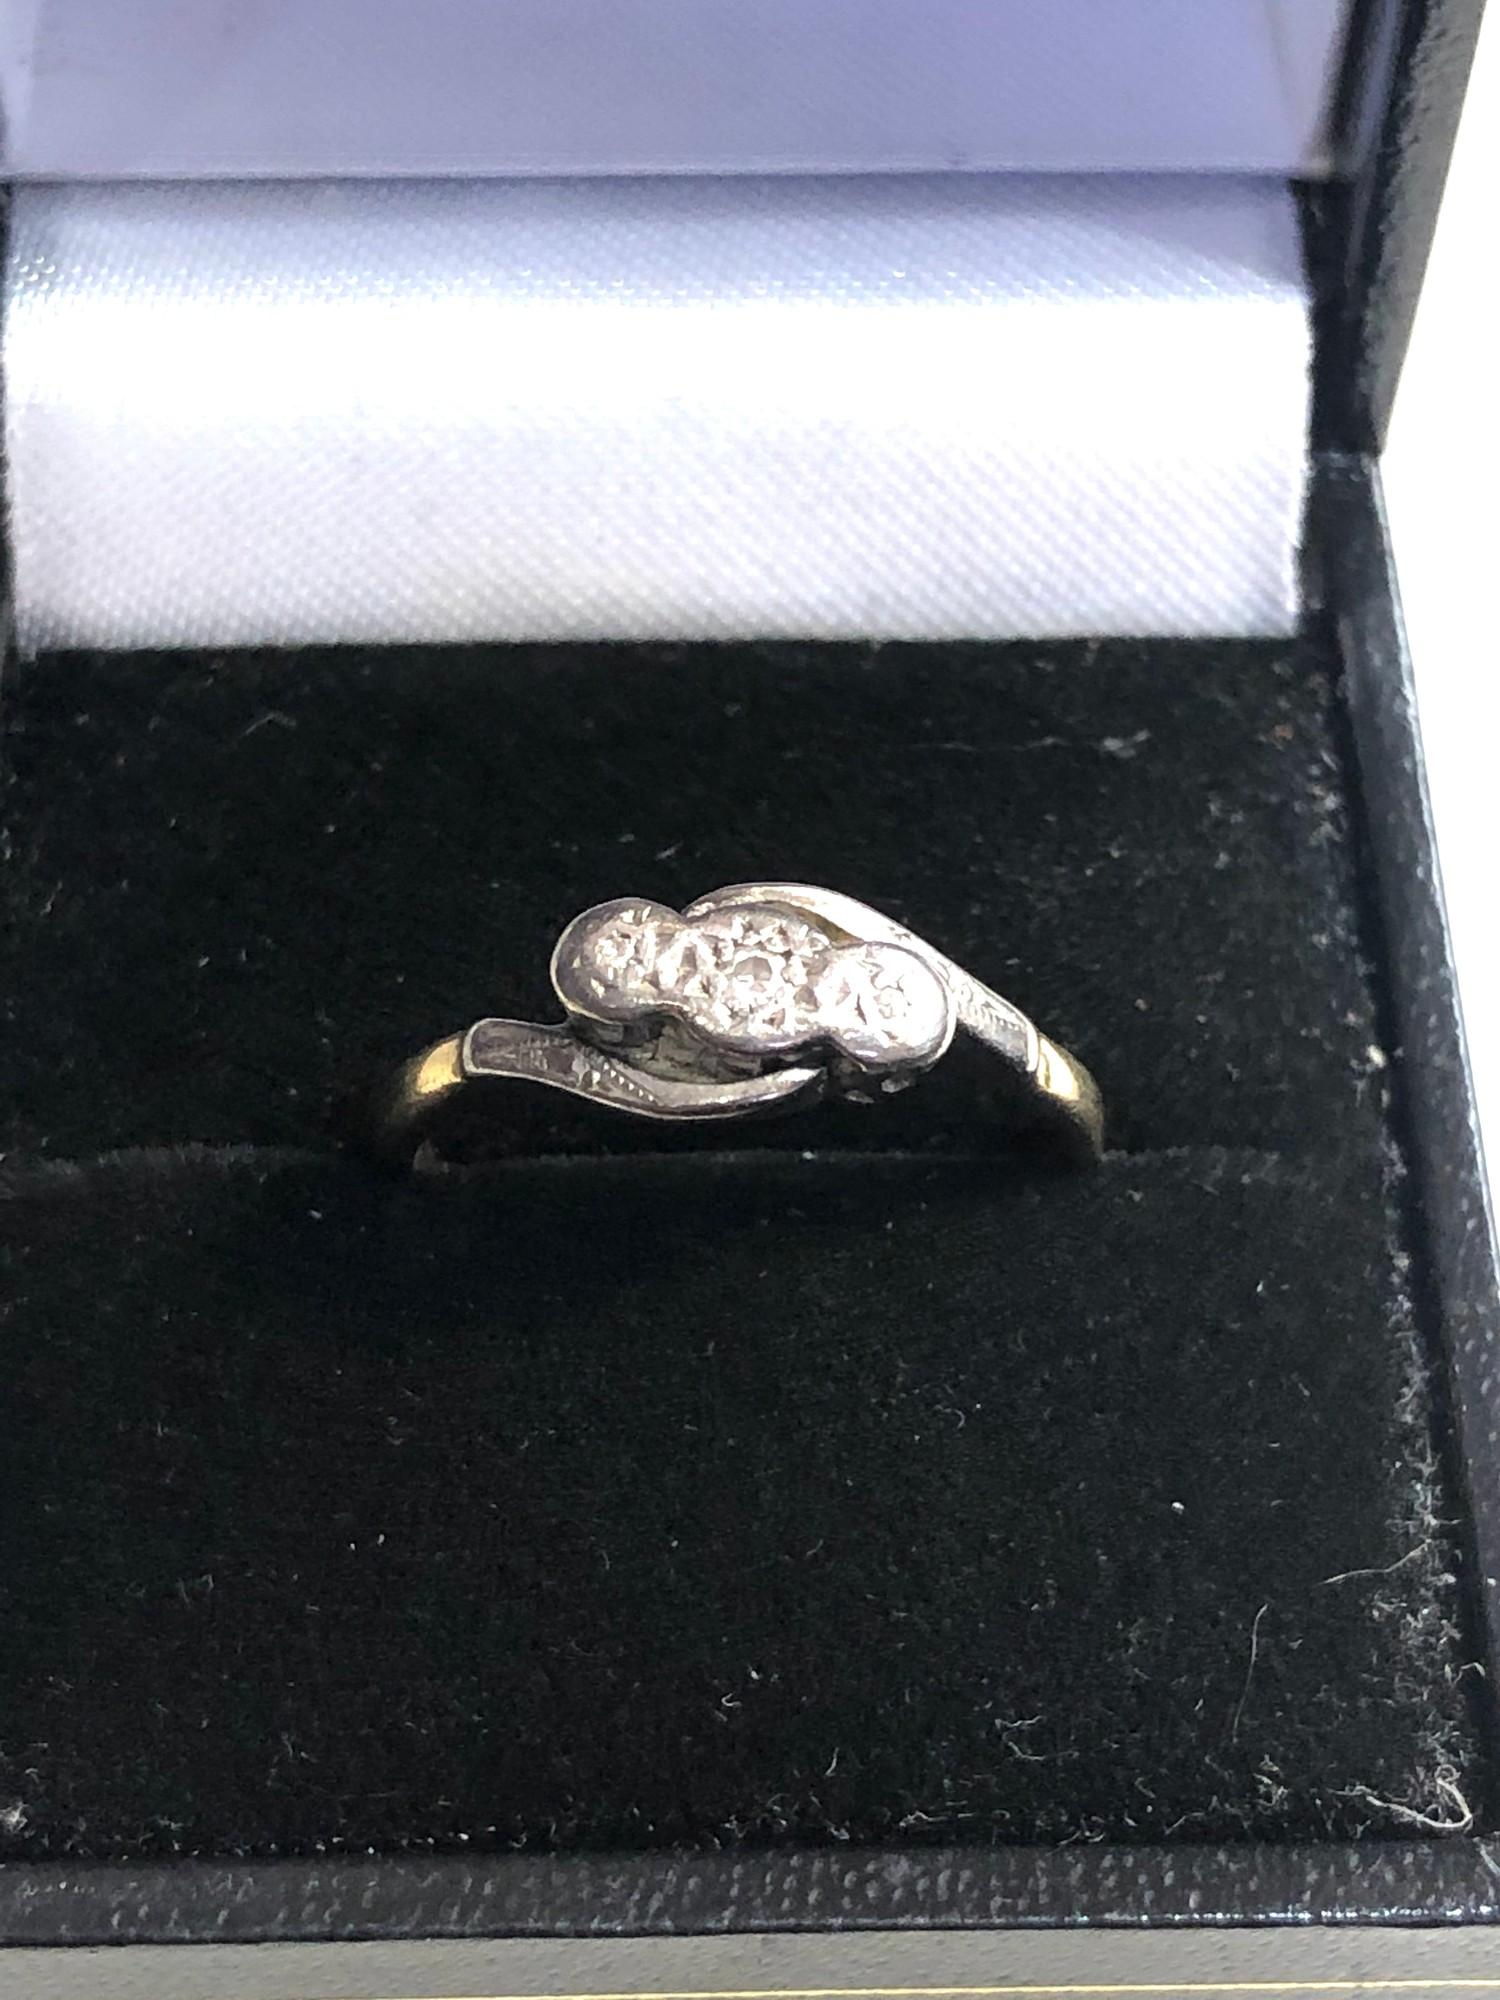 Antique 18ct & platinum diamond trilogy ring weight 2.8g